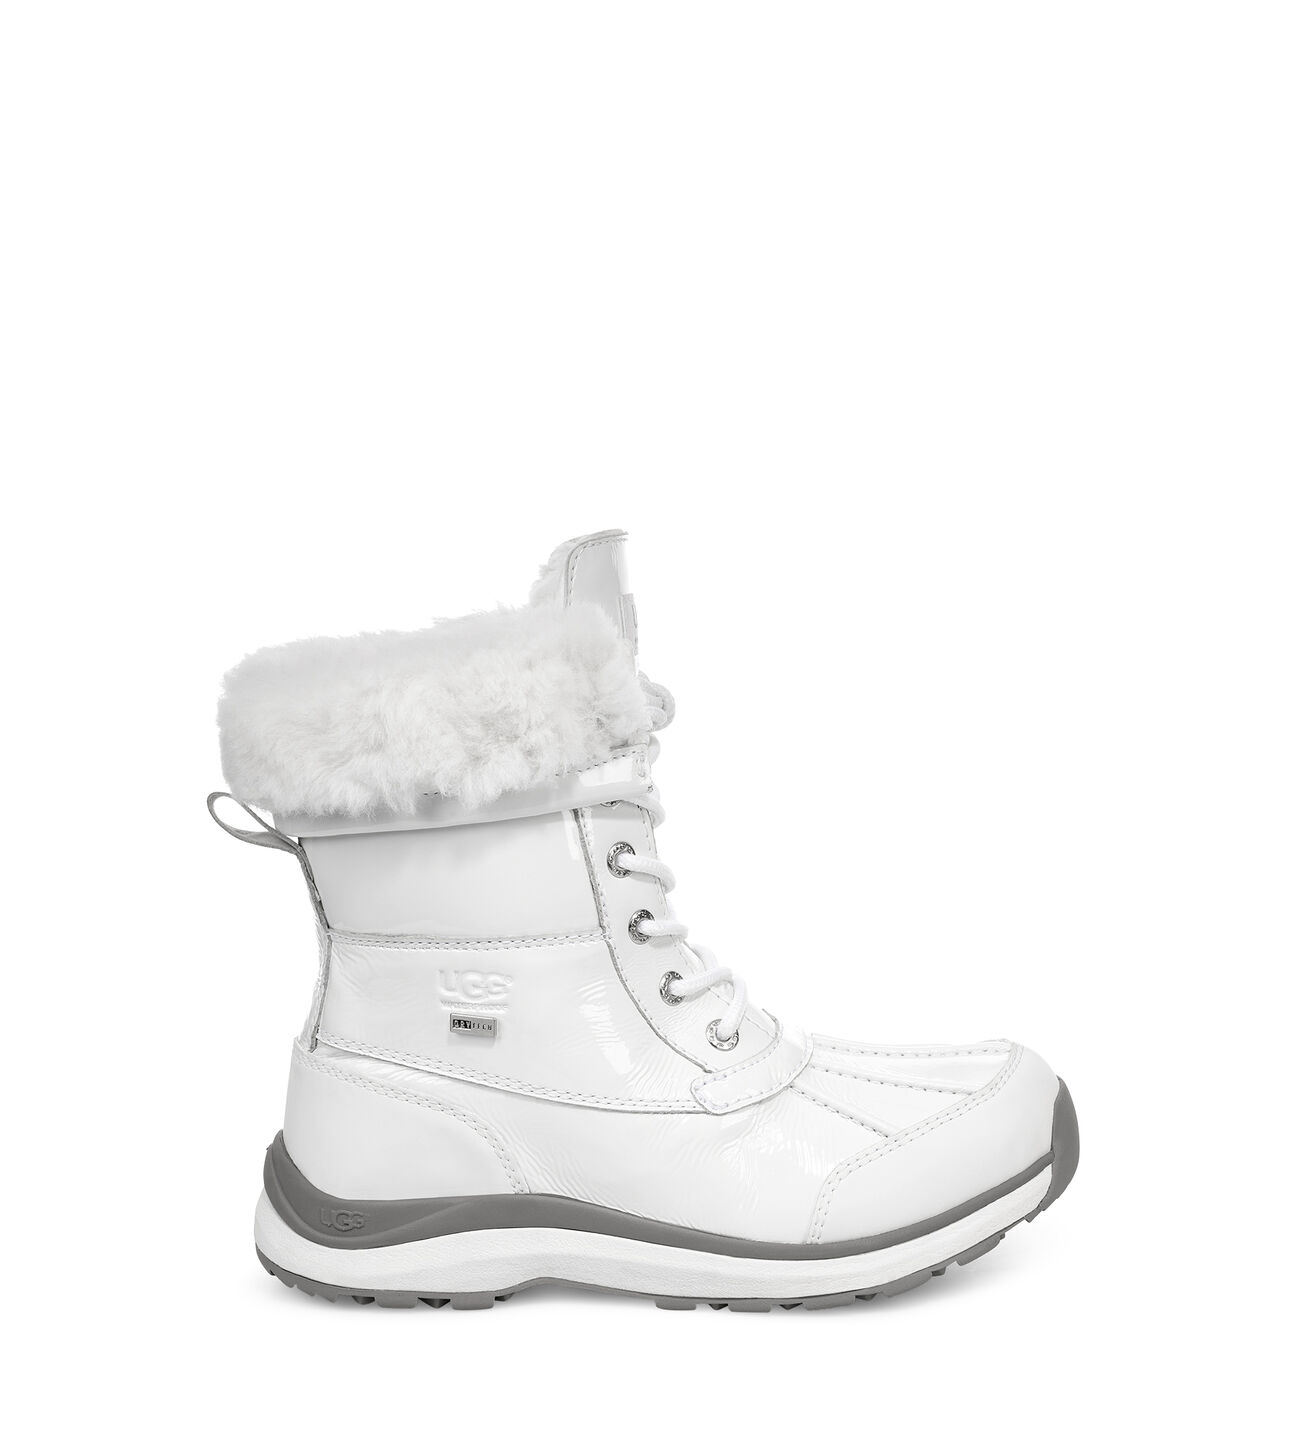 dfe77c7022a Adirondack III Patent Boot